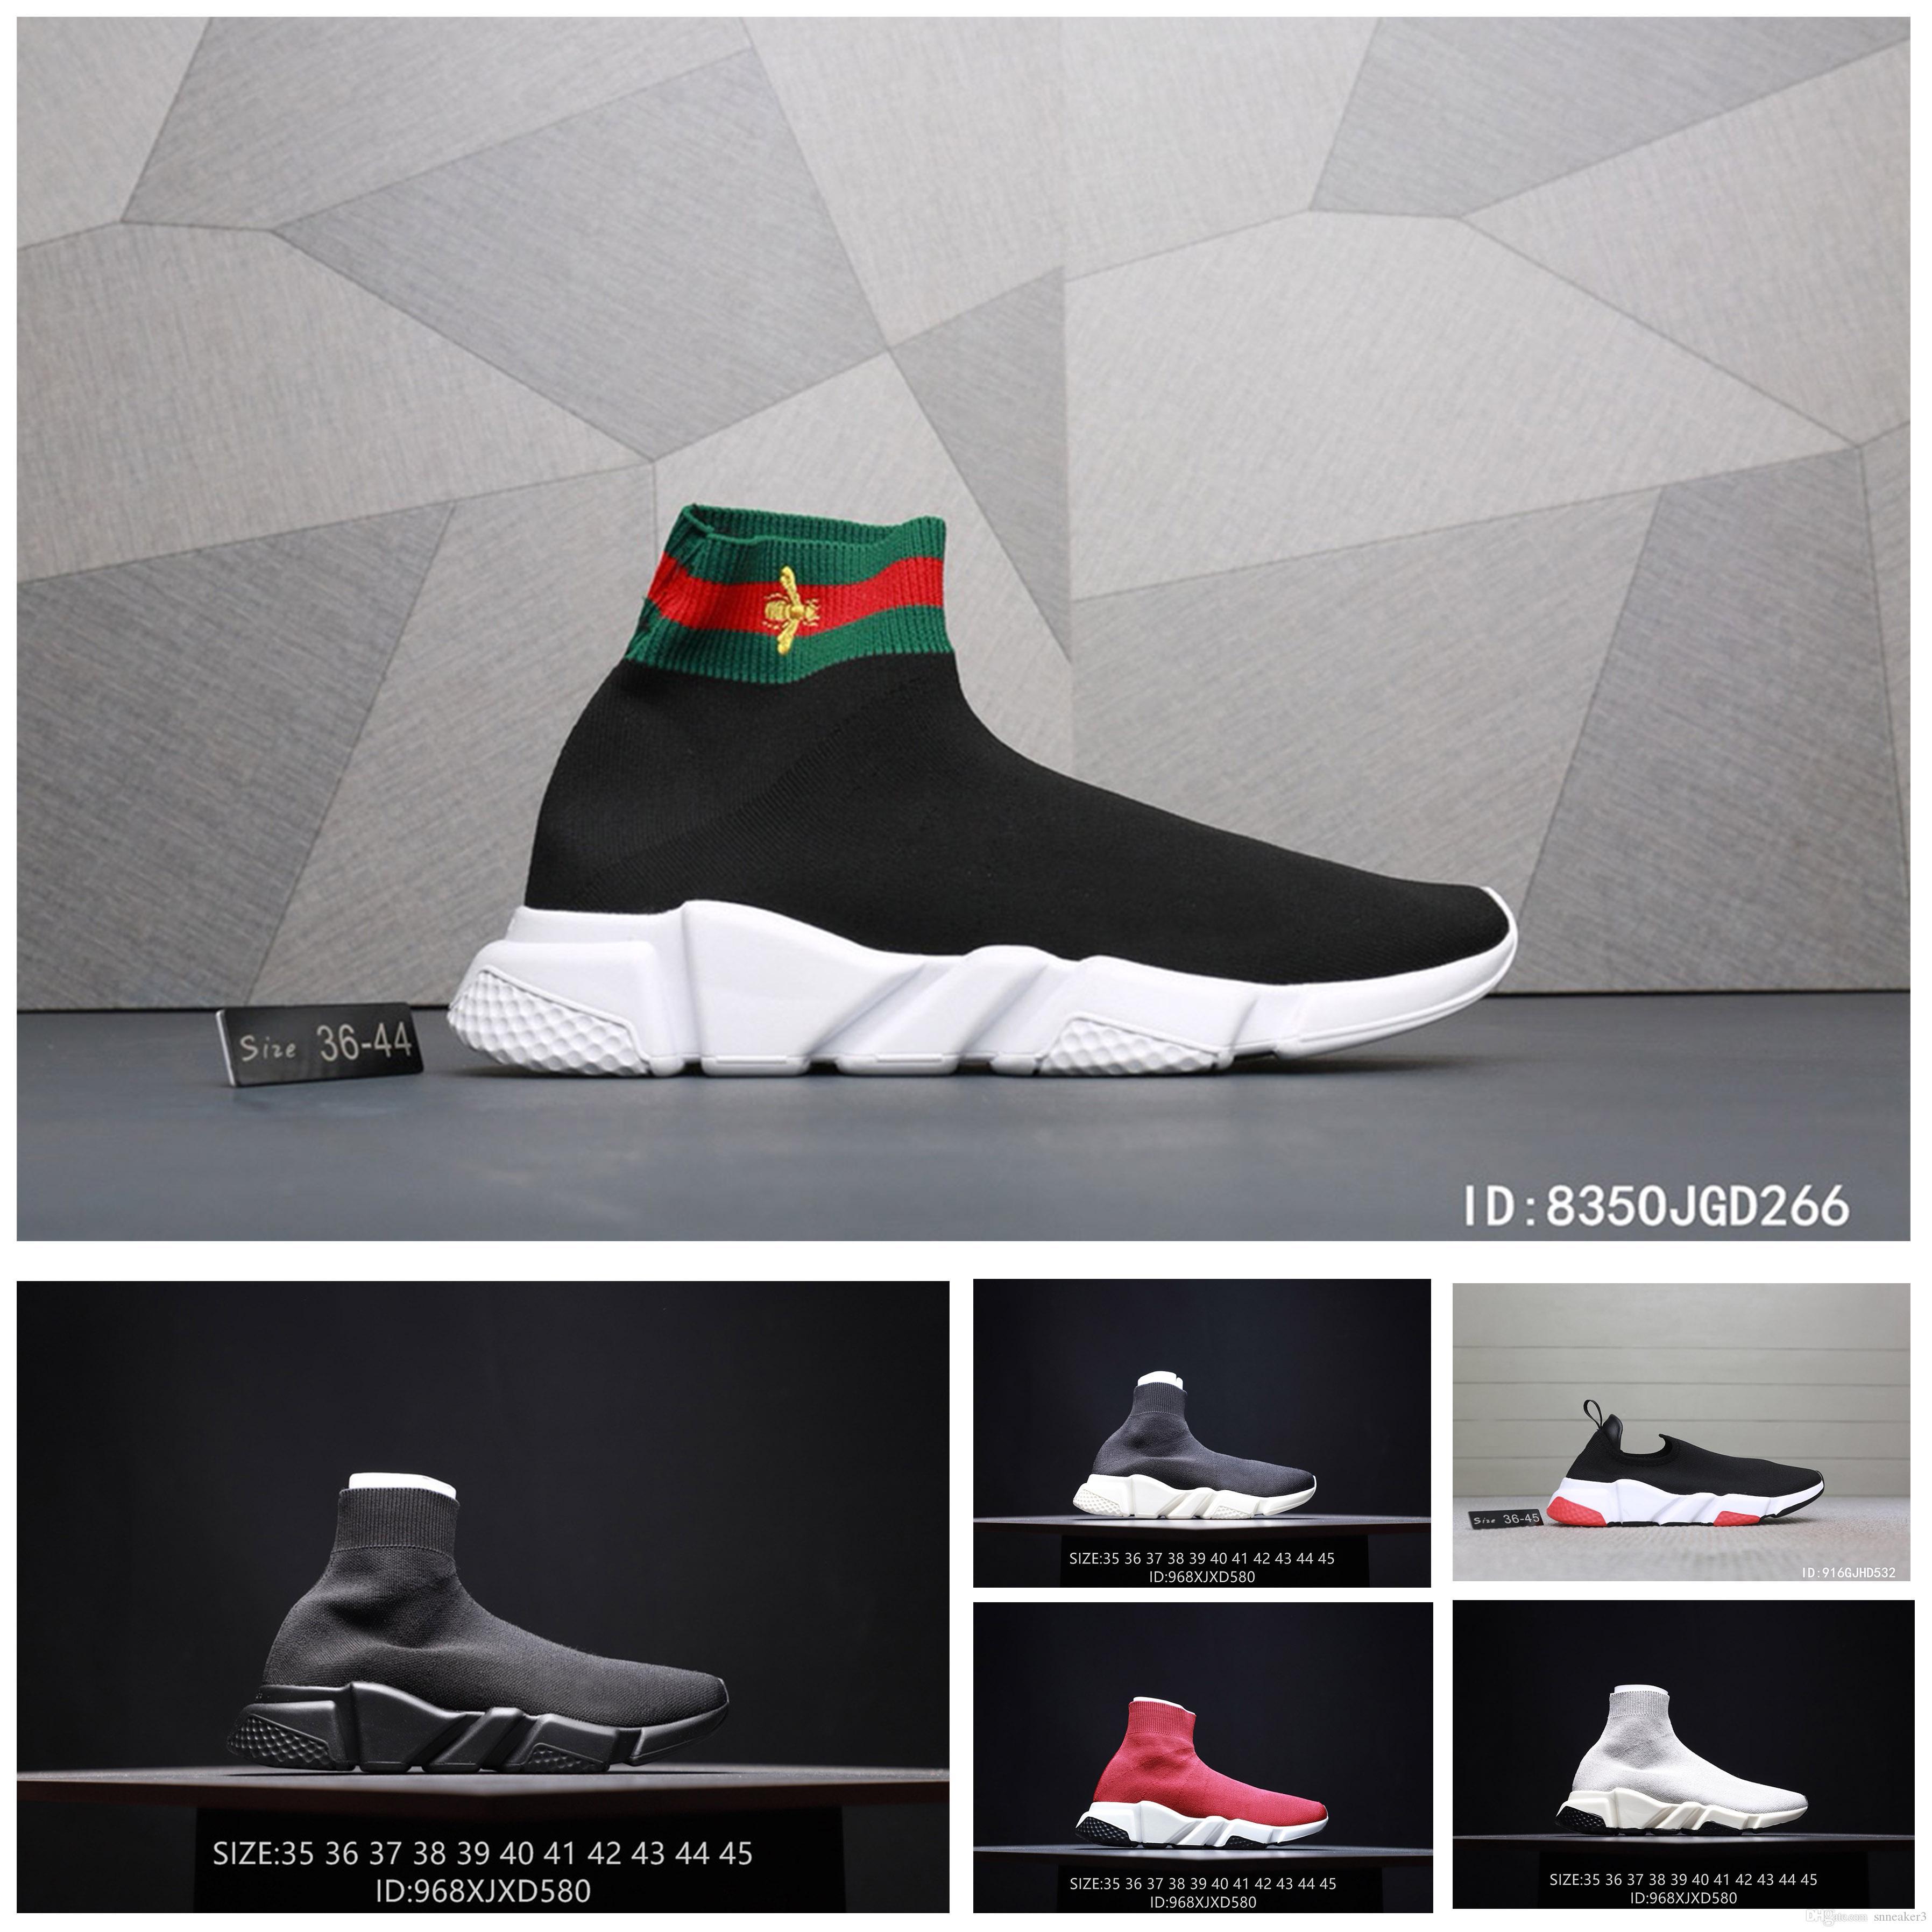 Grosshandel Balenciaga Shoes Scarpe Gucci Luxusmarke Designer Schuhe